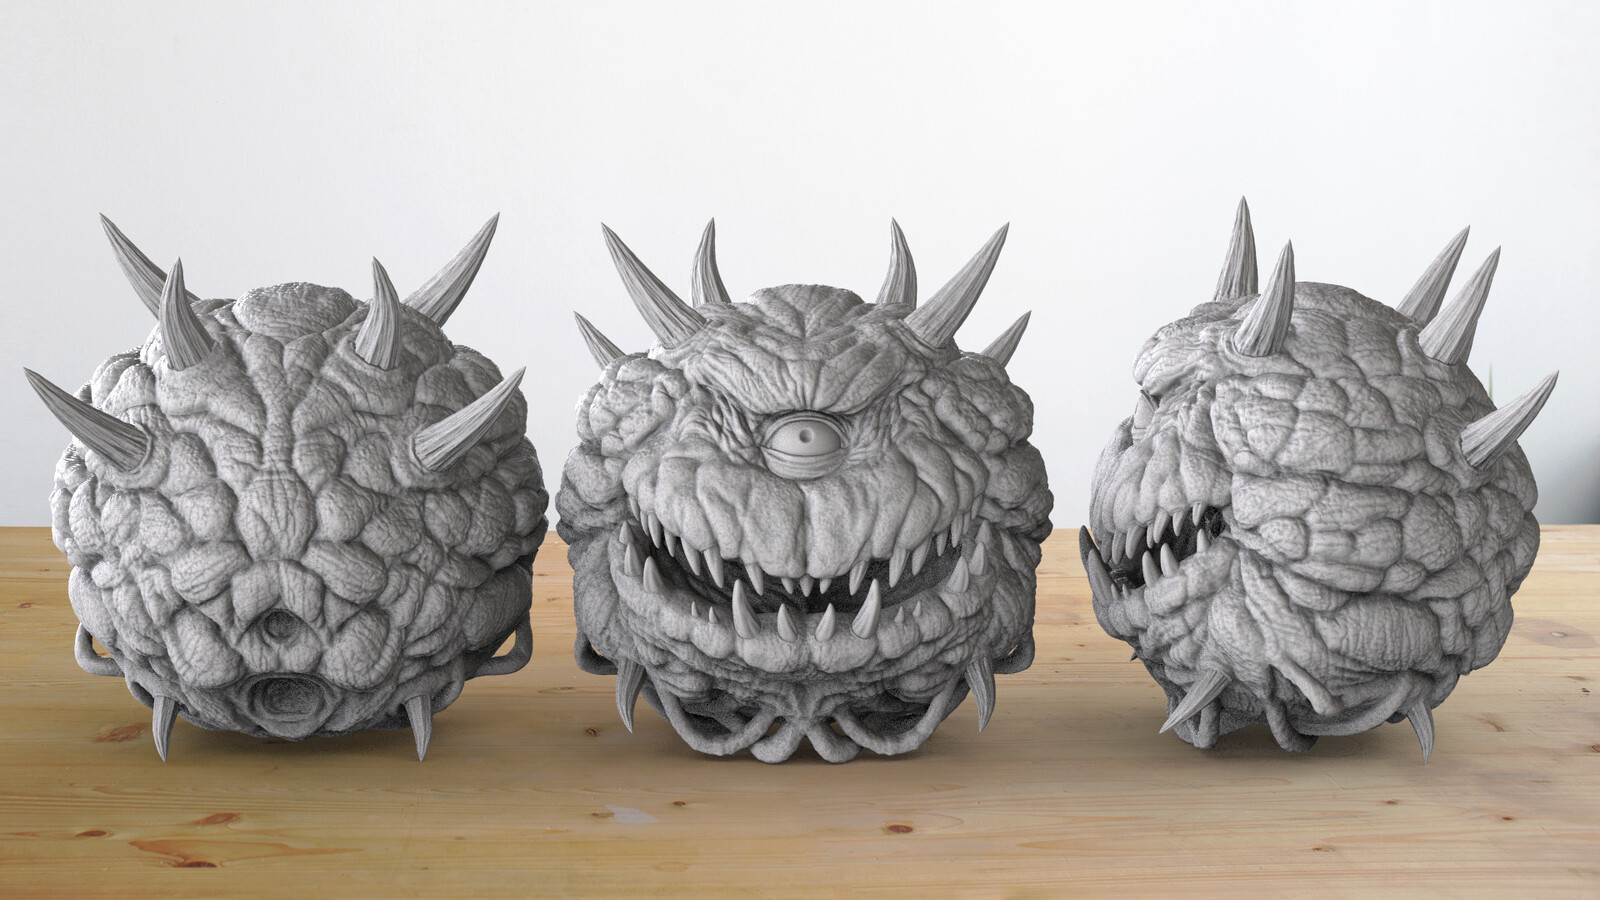 https://www.cgtrader.com/3d-print-models/miniatures/figurines/cacodemon-68451f3e-48d0-40dd-9d5d-ddb5bfa8b13b